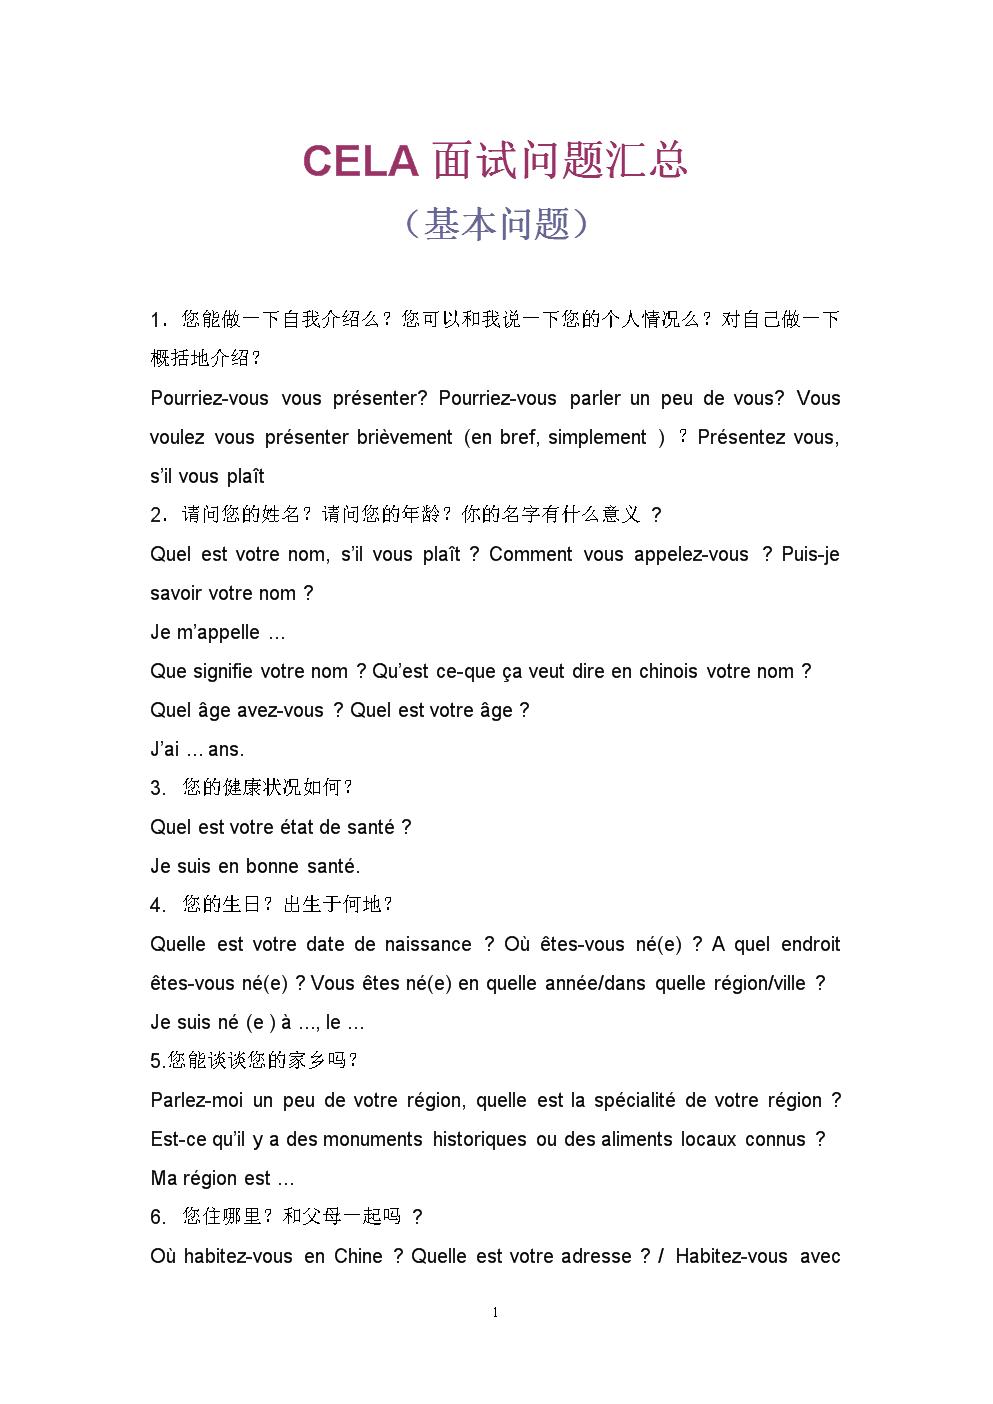 CELA面试问题汇总.doc